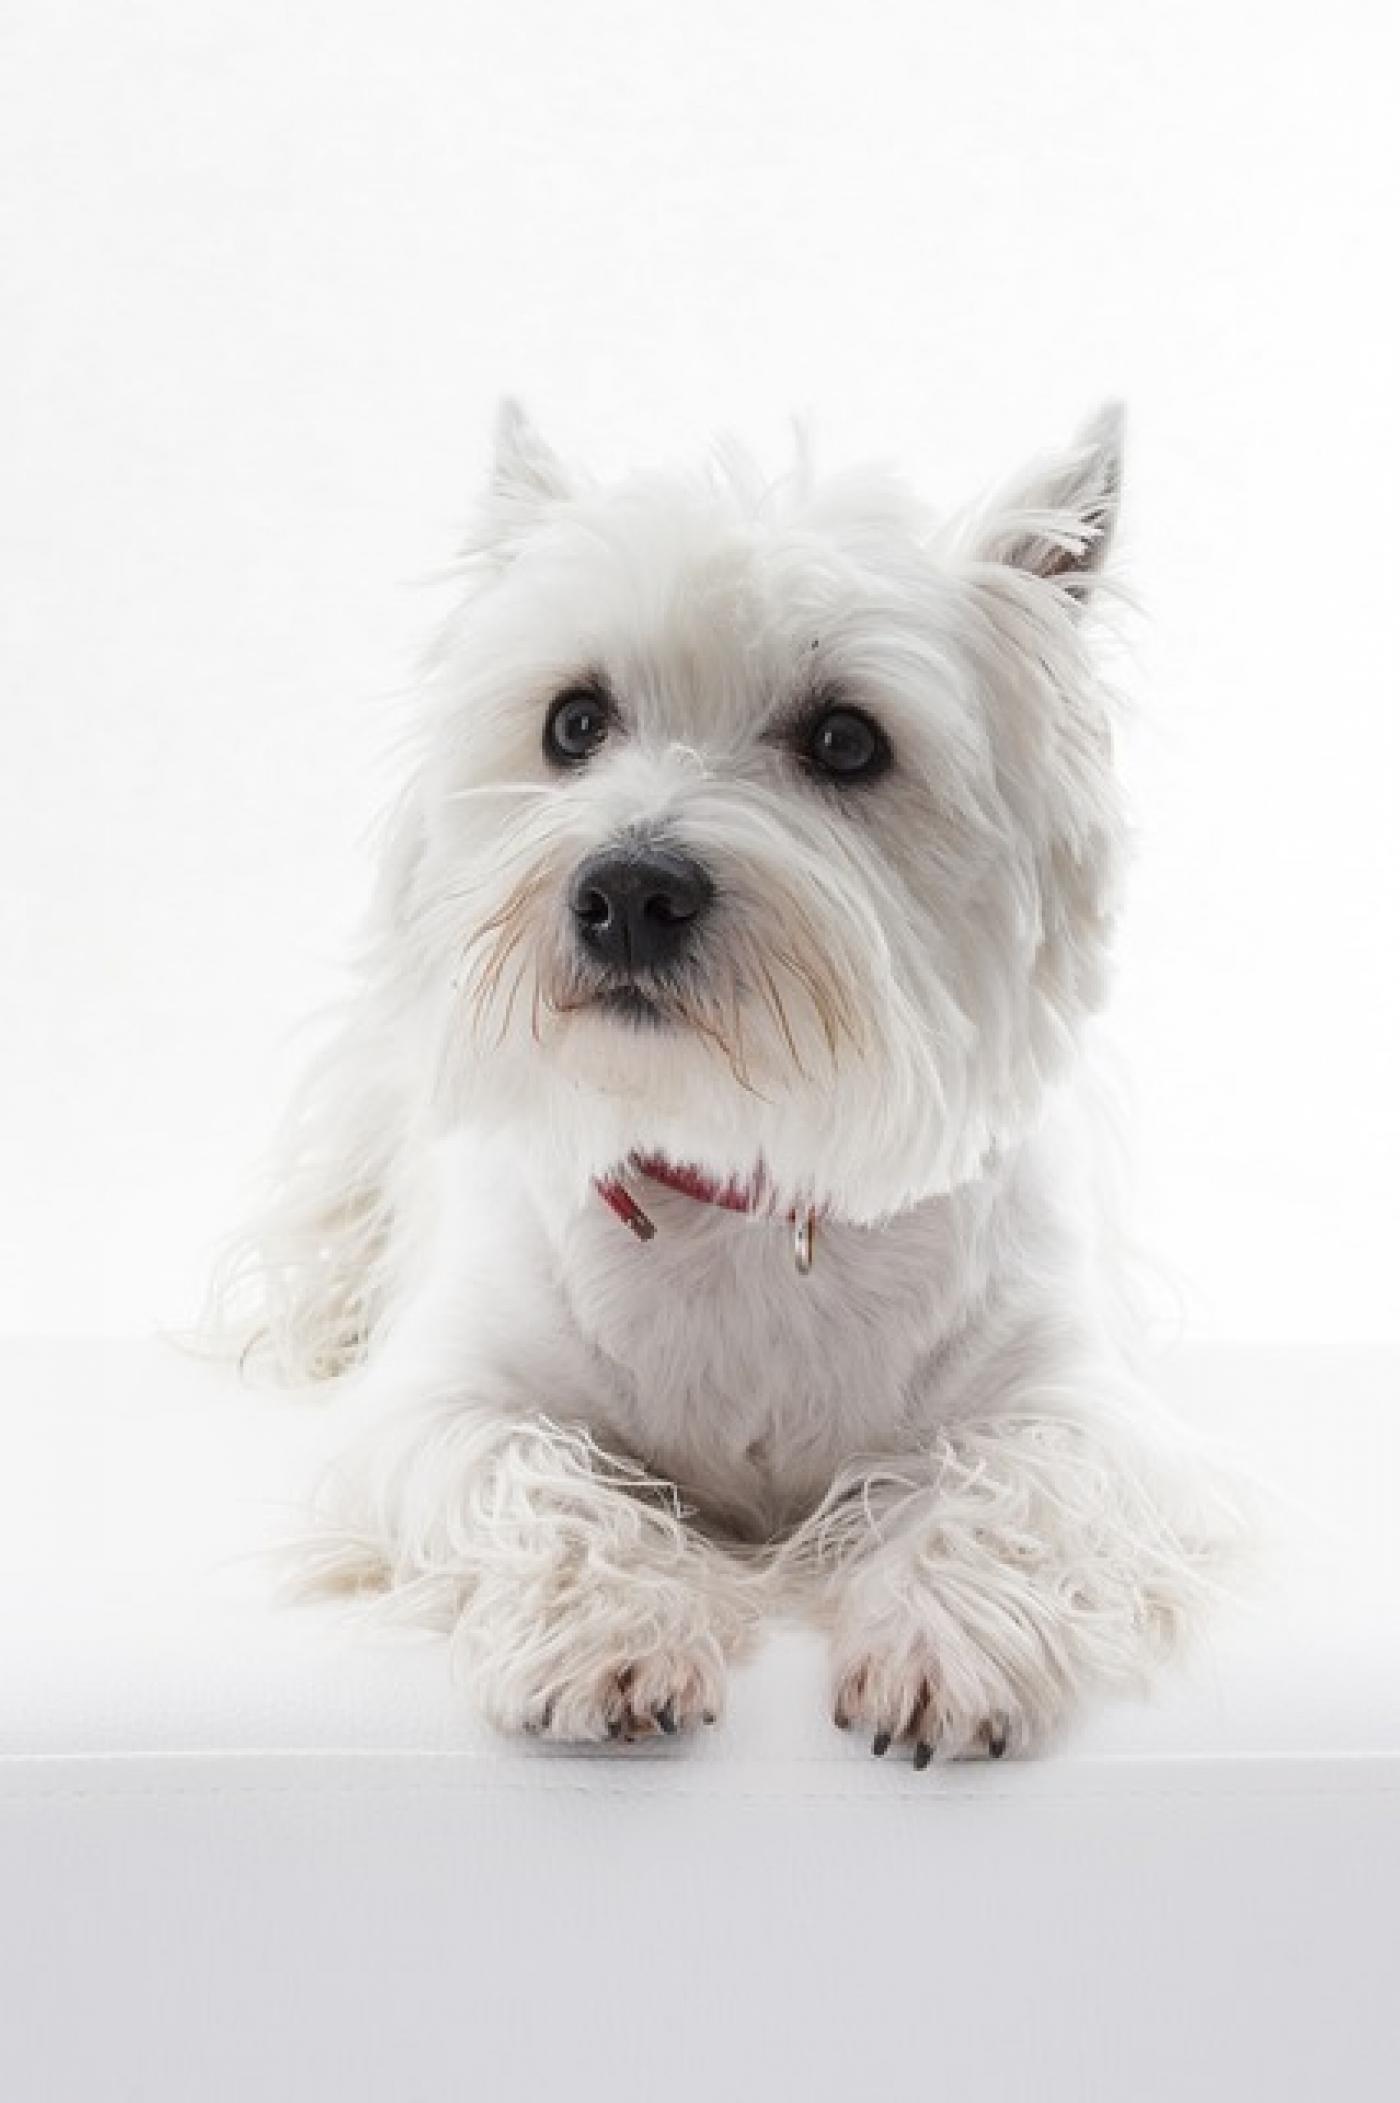 Dog Grooming Tutorial How To Groom Your Westie Dogs Delight Grooming School